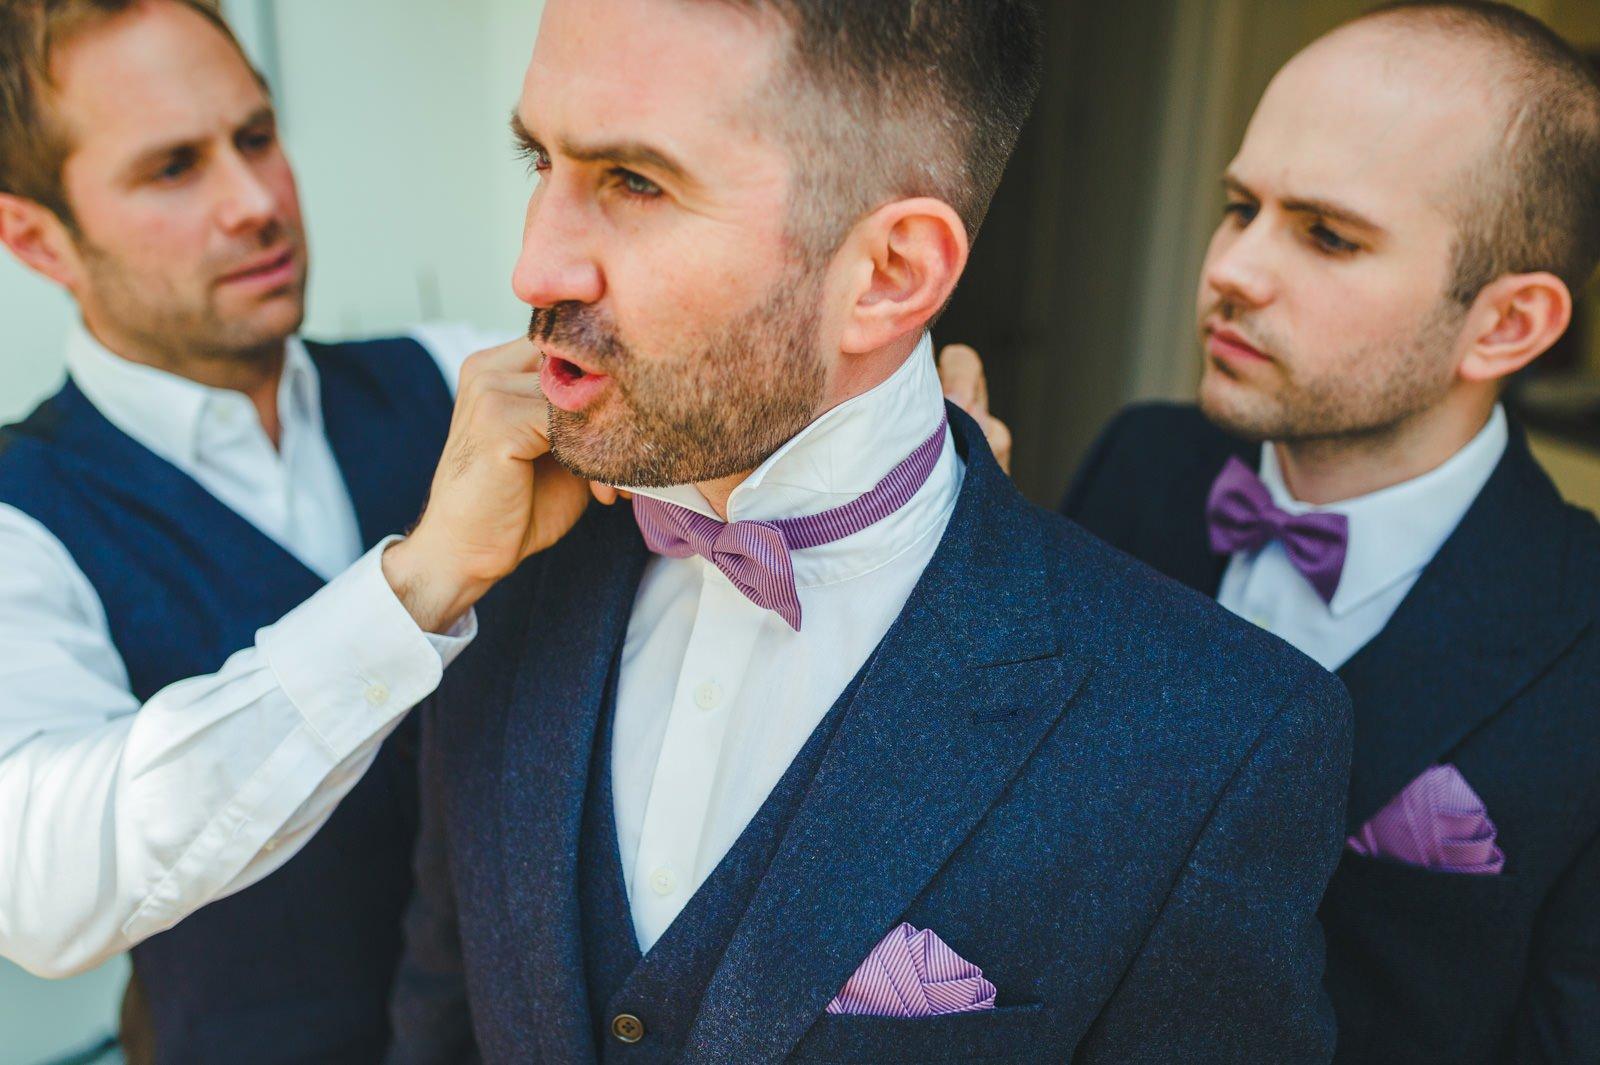 Millers Of Netley wedding, Dorrington, Shrewsbury | Emma + Ben 8